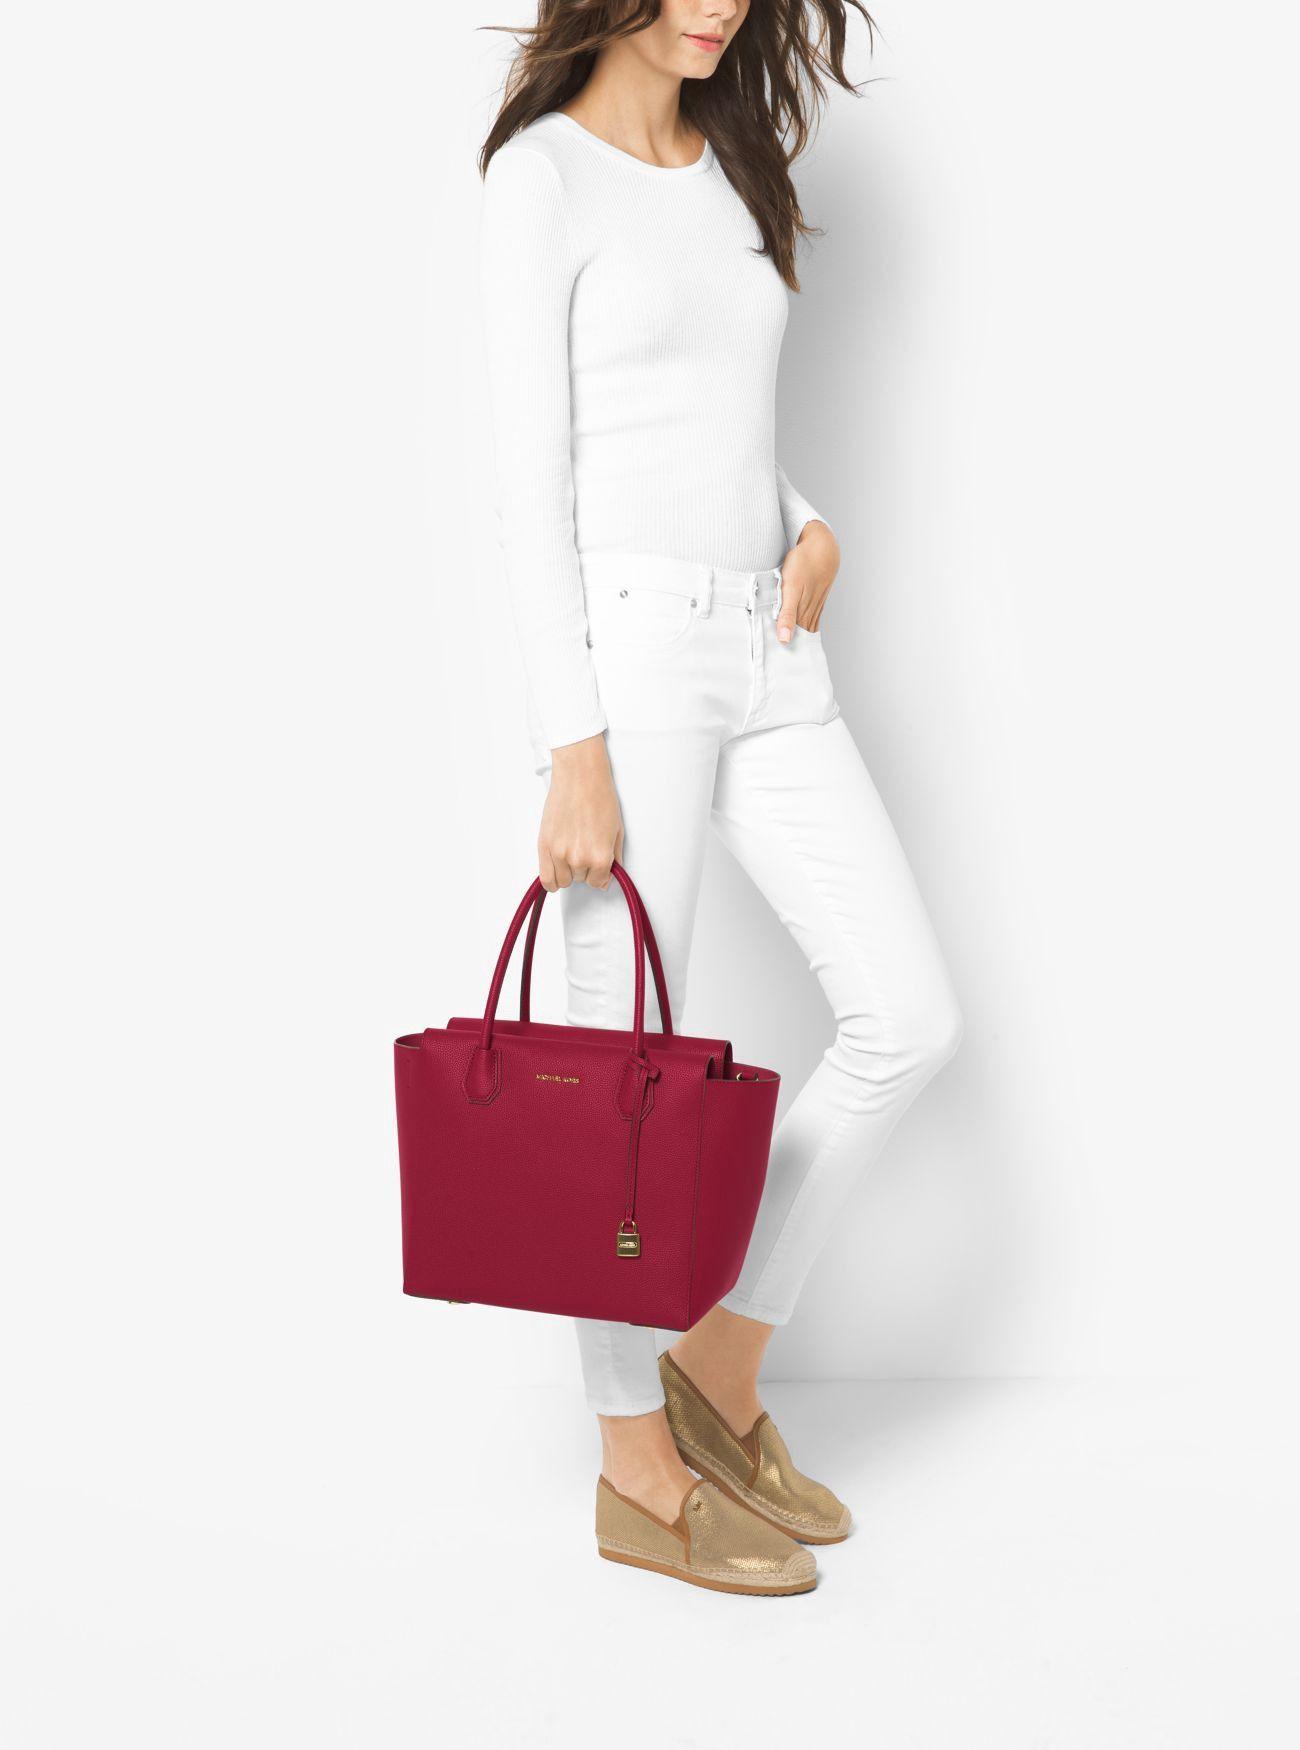 e62a8df3e498 MICHAEL KORS Mercer Large Leather Satchel. #michaelkors #bags #canvas  #polyester #leather #lining #satchel #shoulder bags #hand bags #